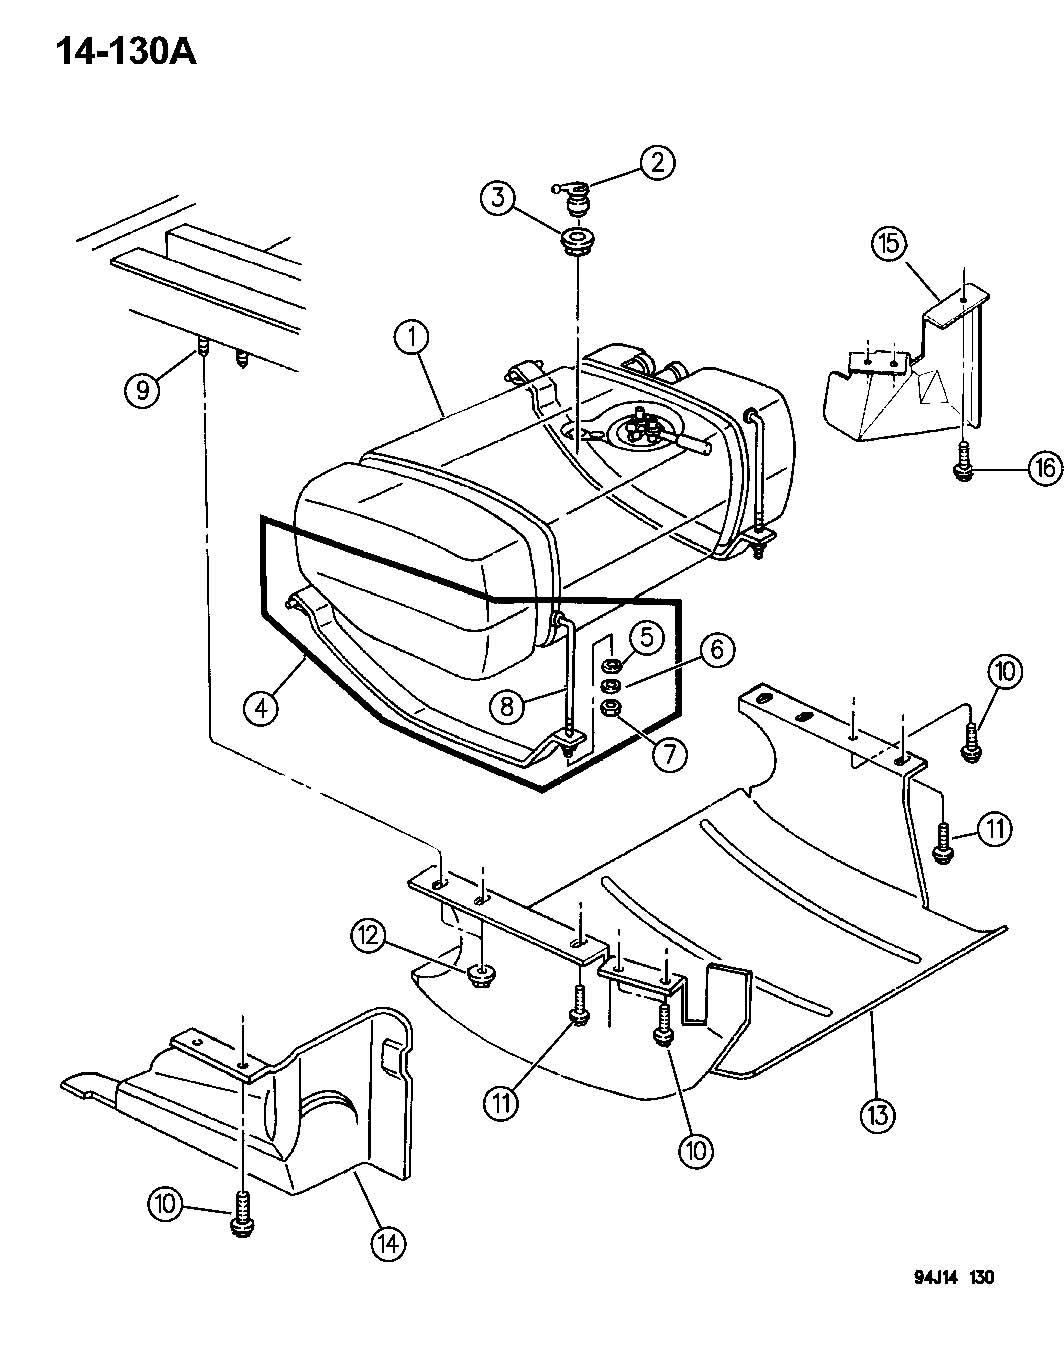 Jeep Cherokee Valve Fuel Tank Rollover Safety Body Filler Tube